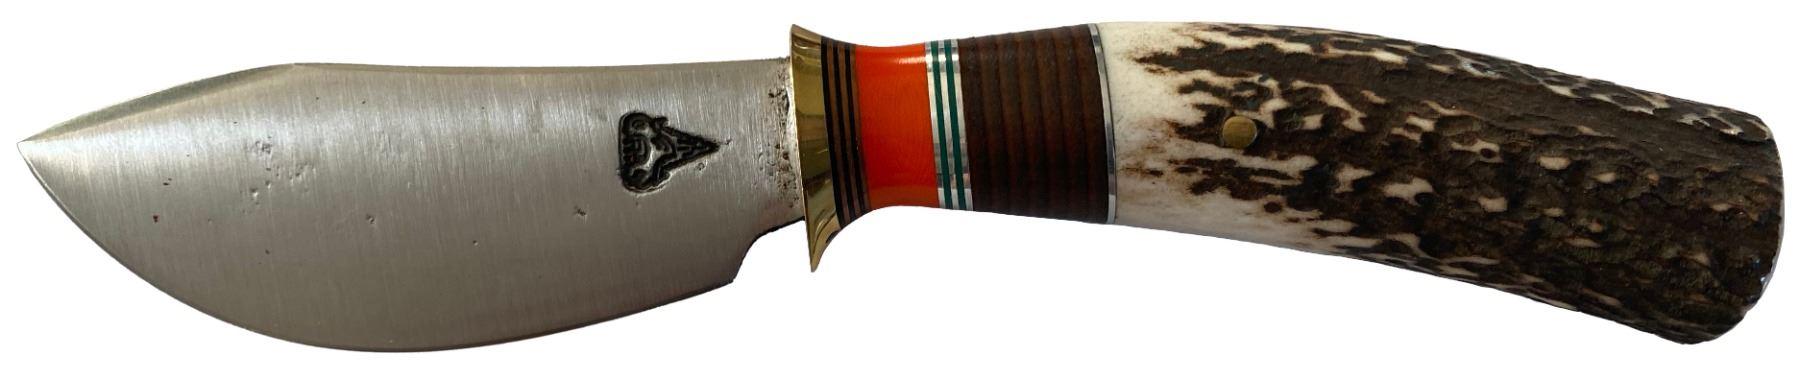 NESSMUK KNIFE FANG MOUNTAIN